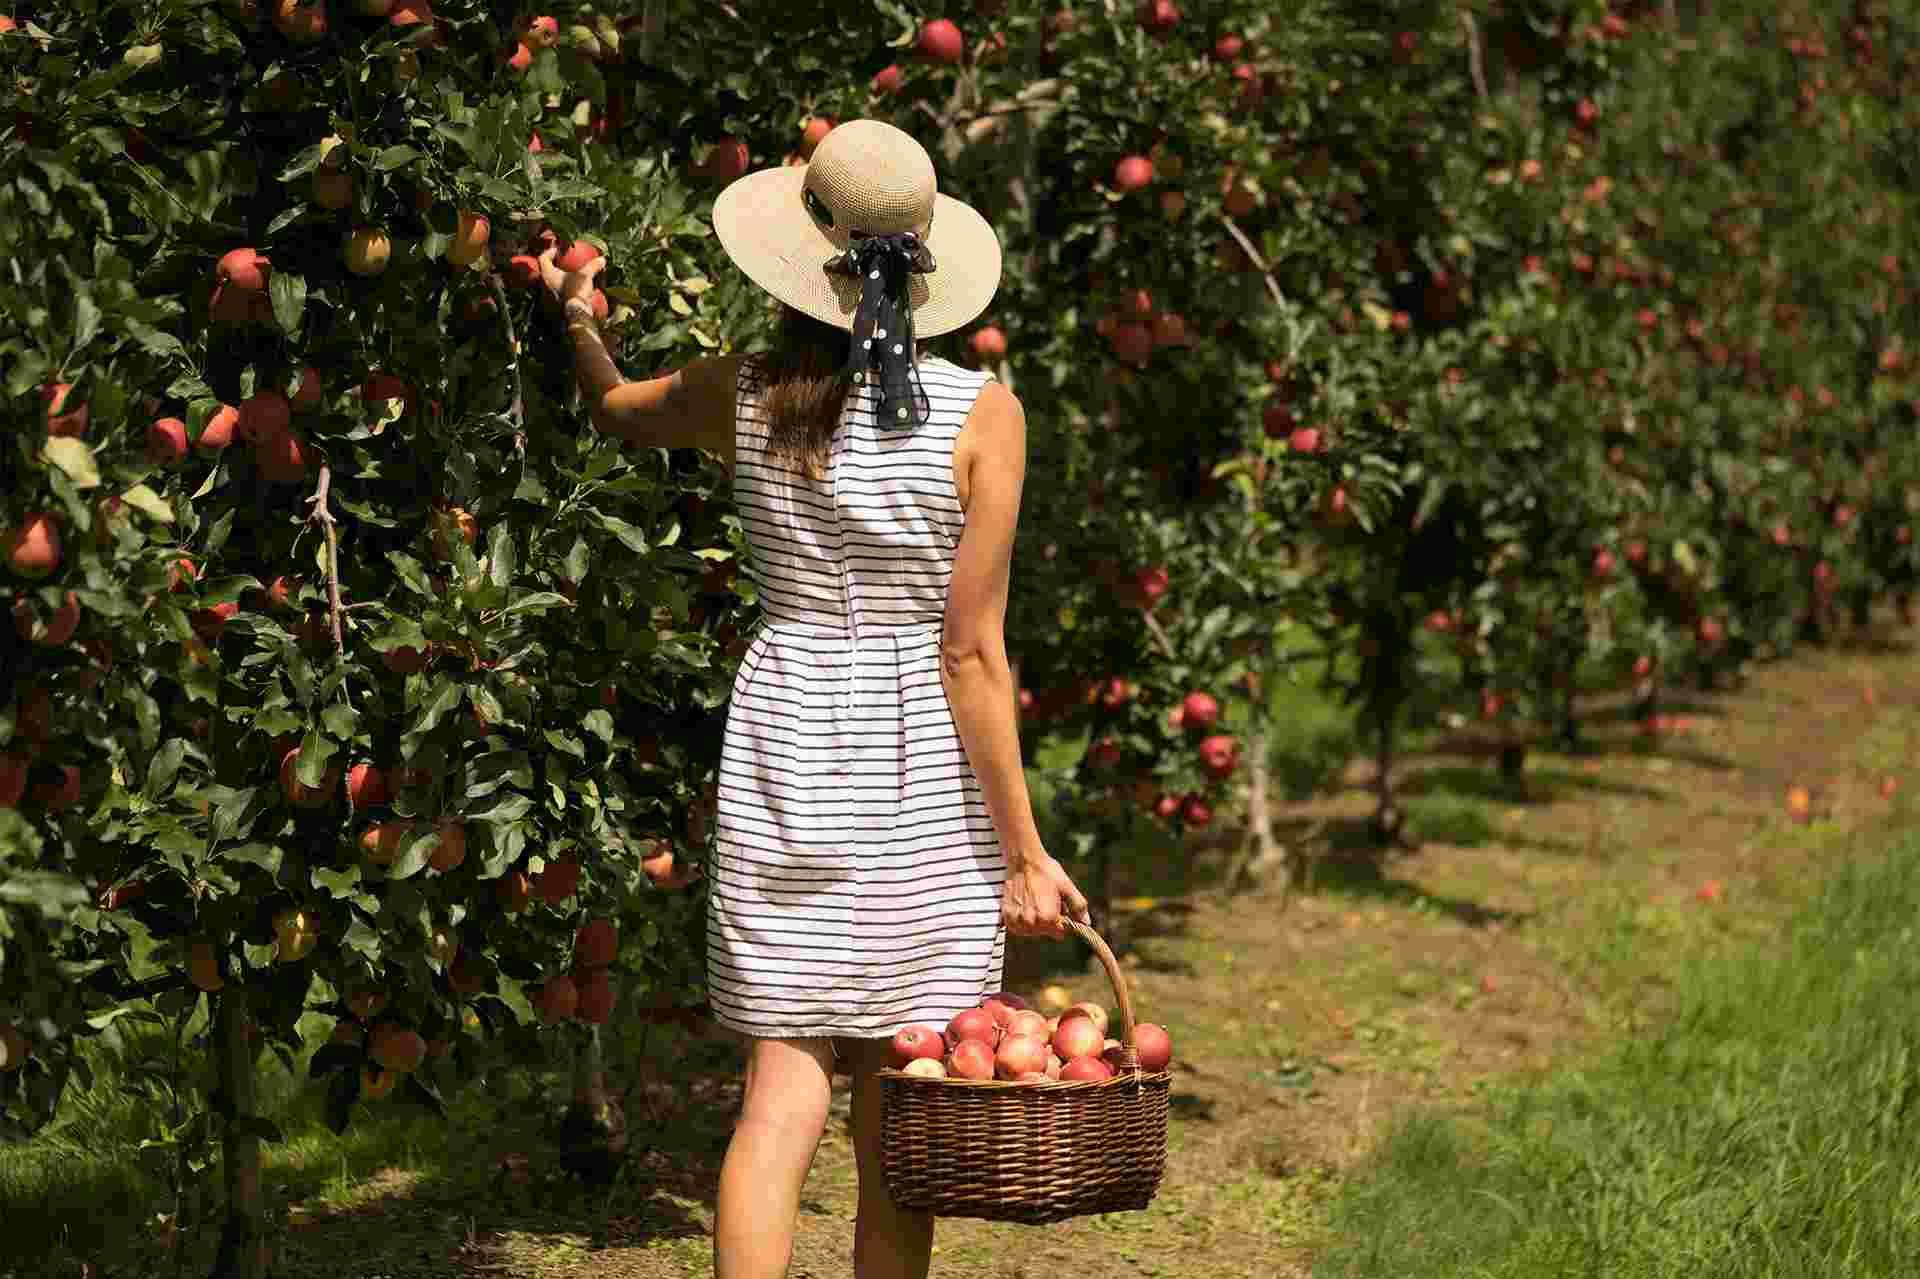 Appleshack at Glenbernie Orchard